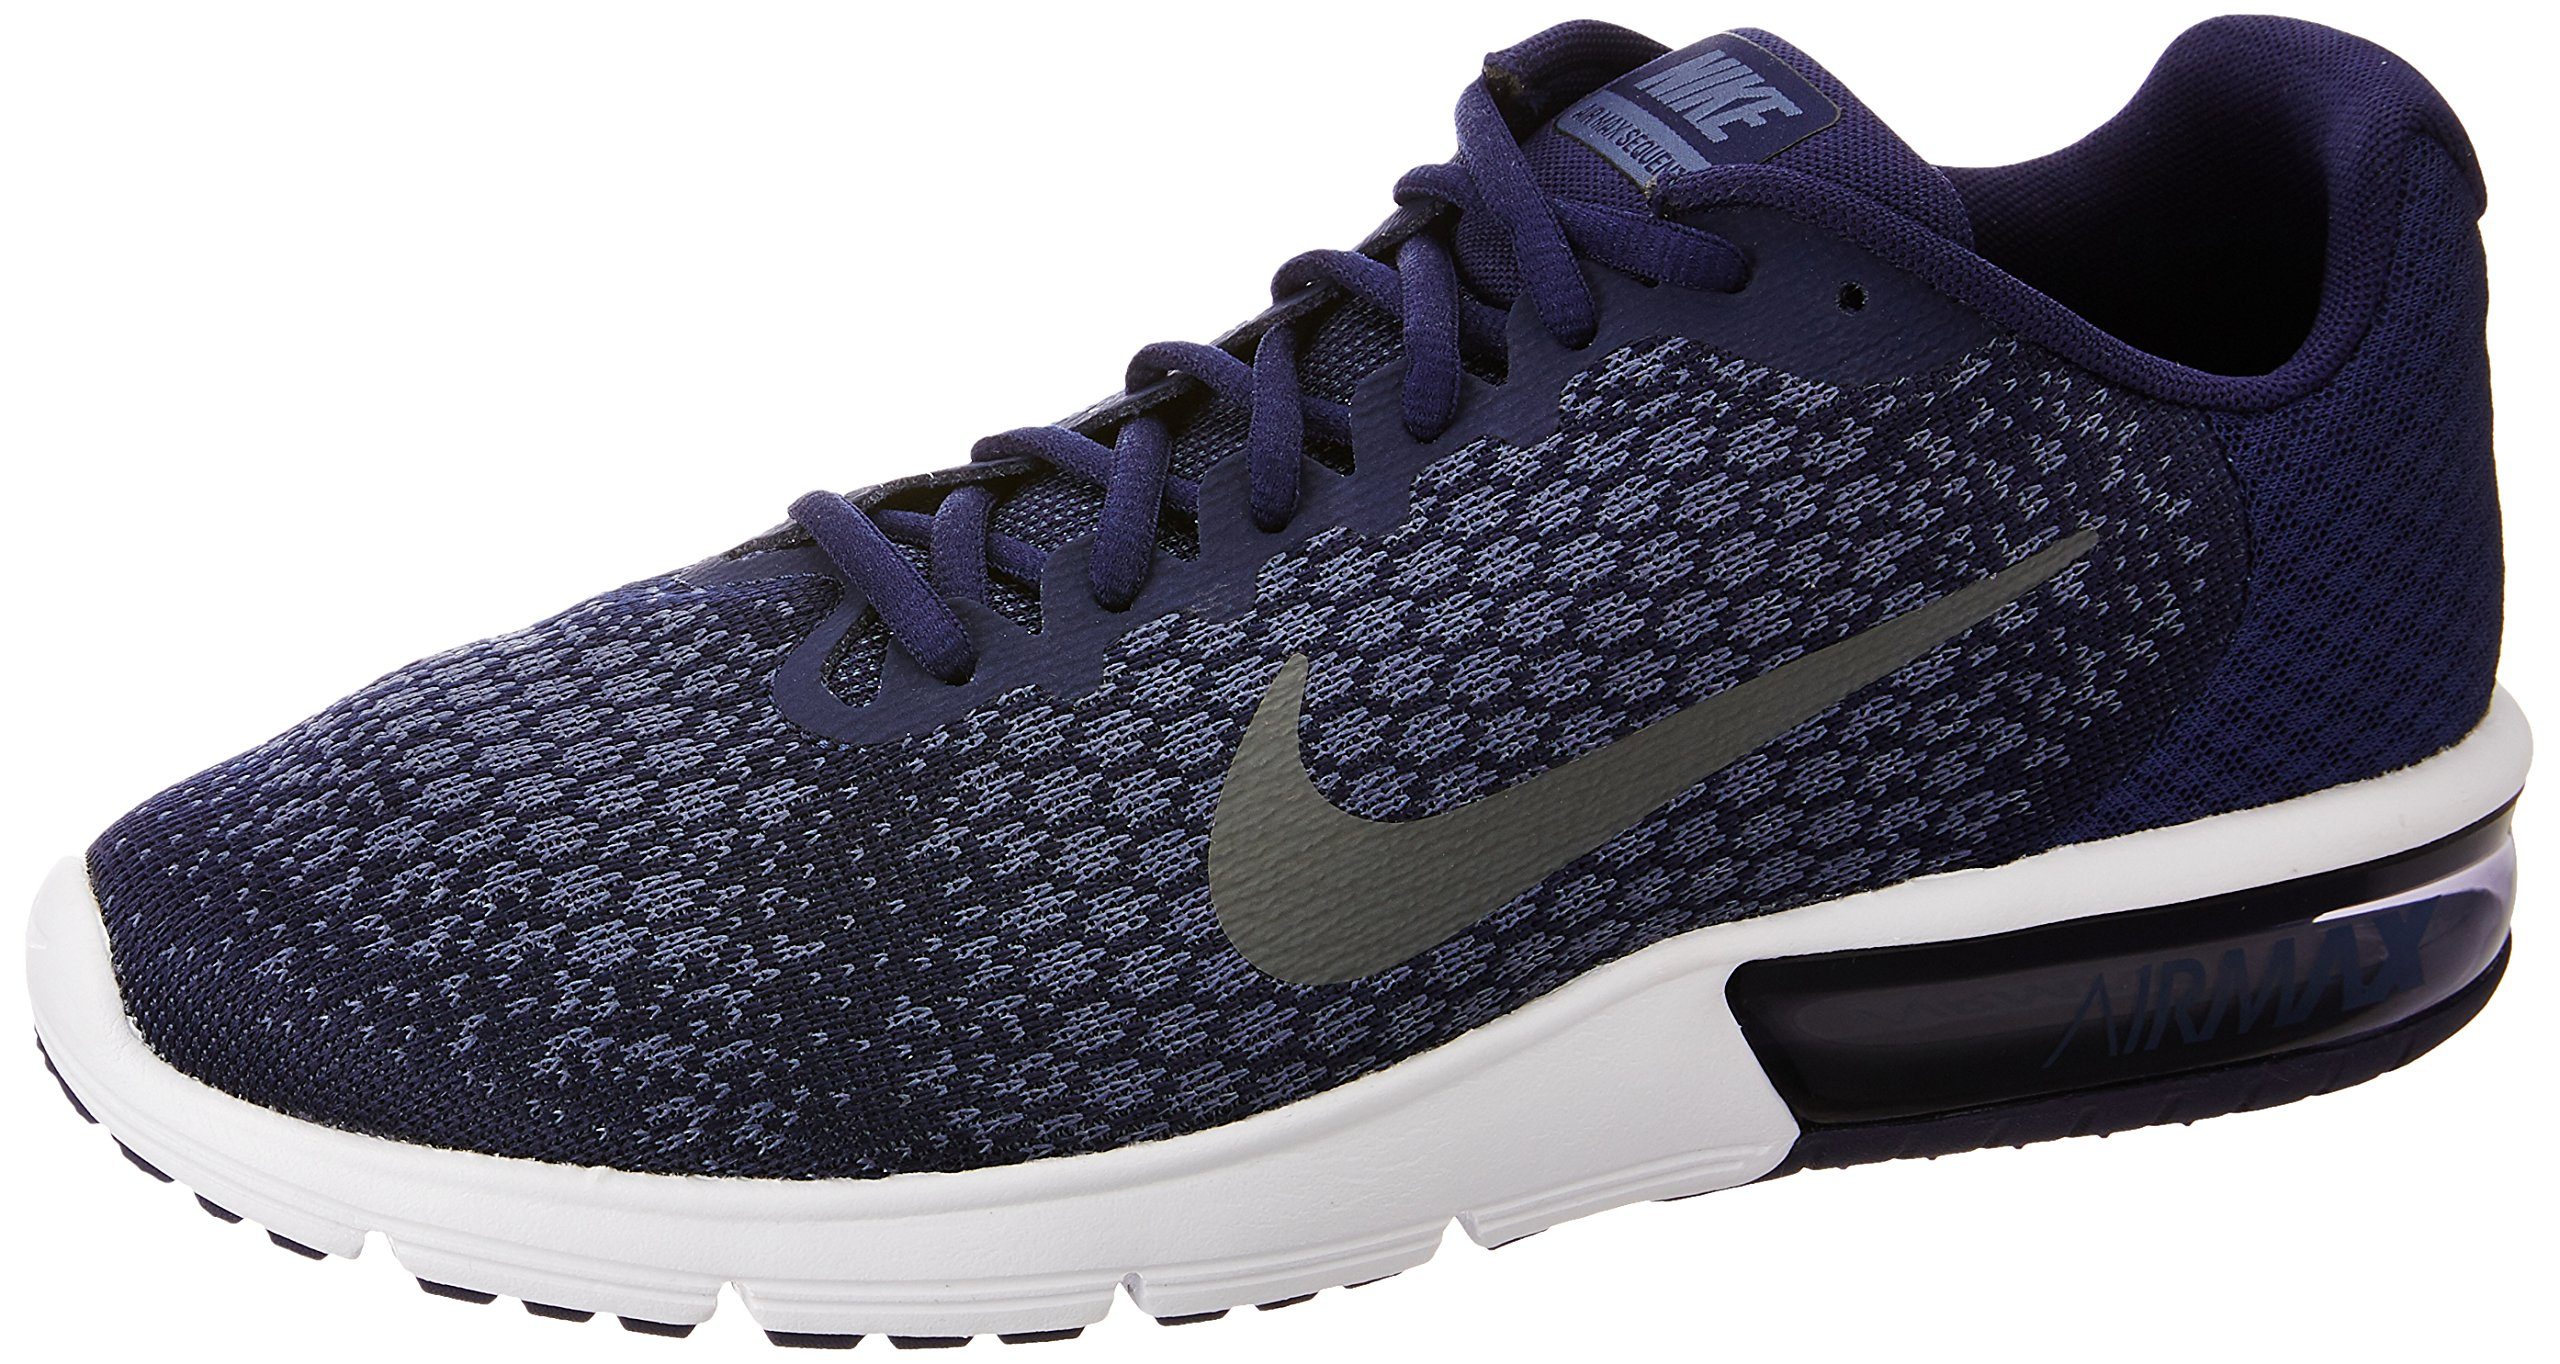 408376ba641660 Men s Nike Air Max Sequent 2 Running Shoe Binary Blue Dark Grey Dark